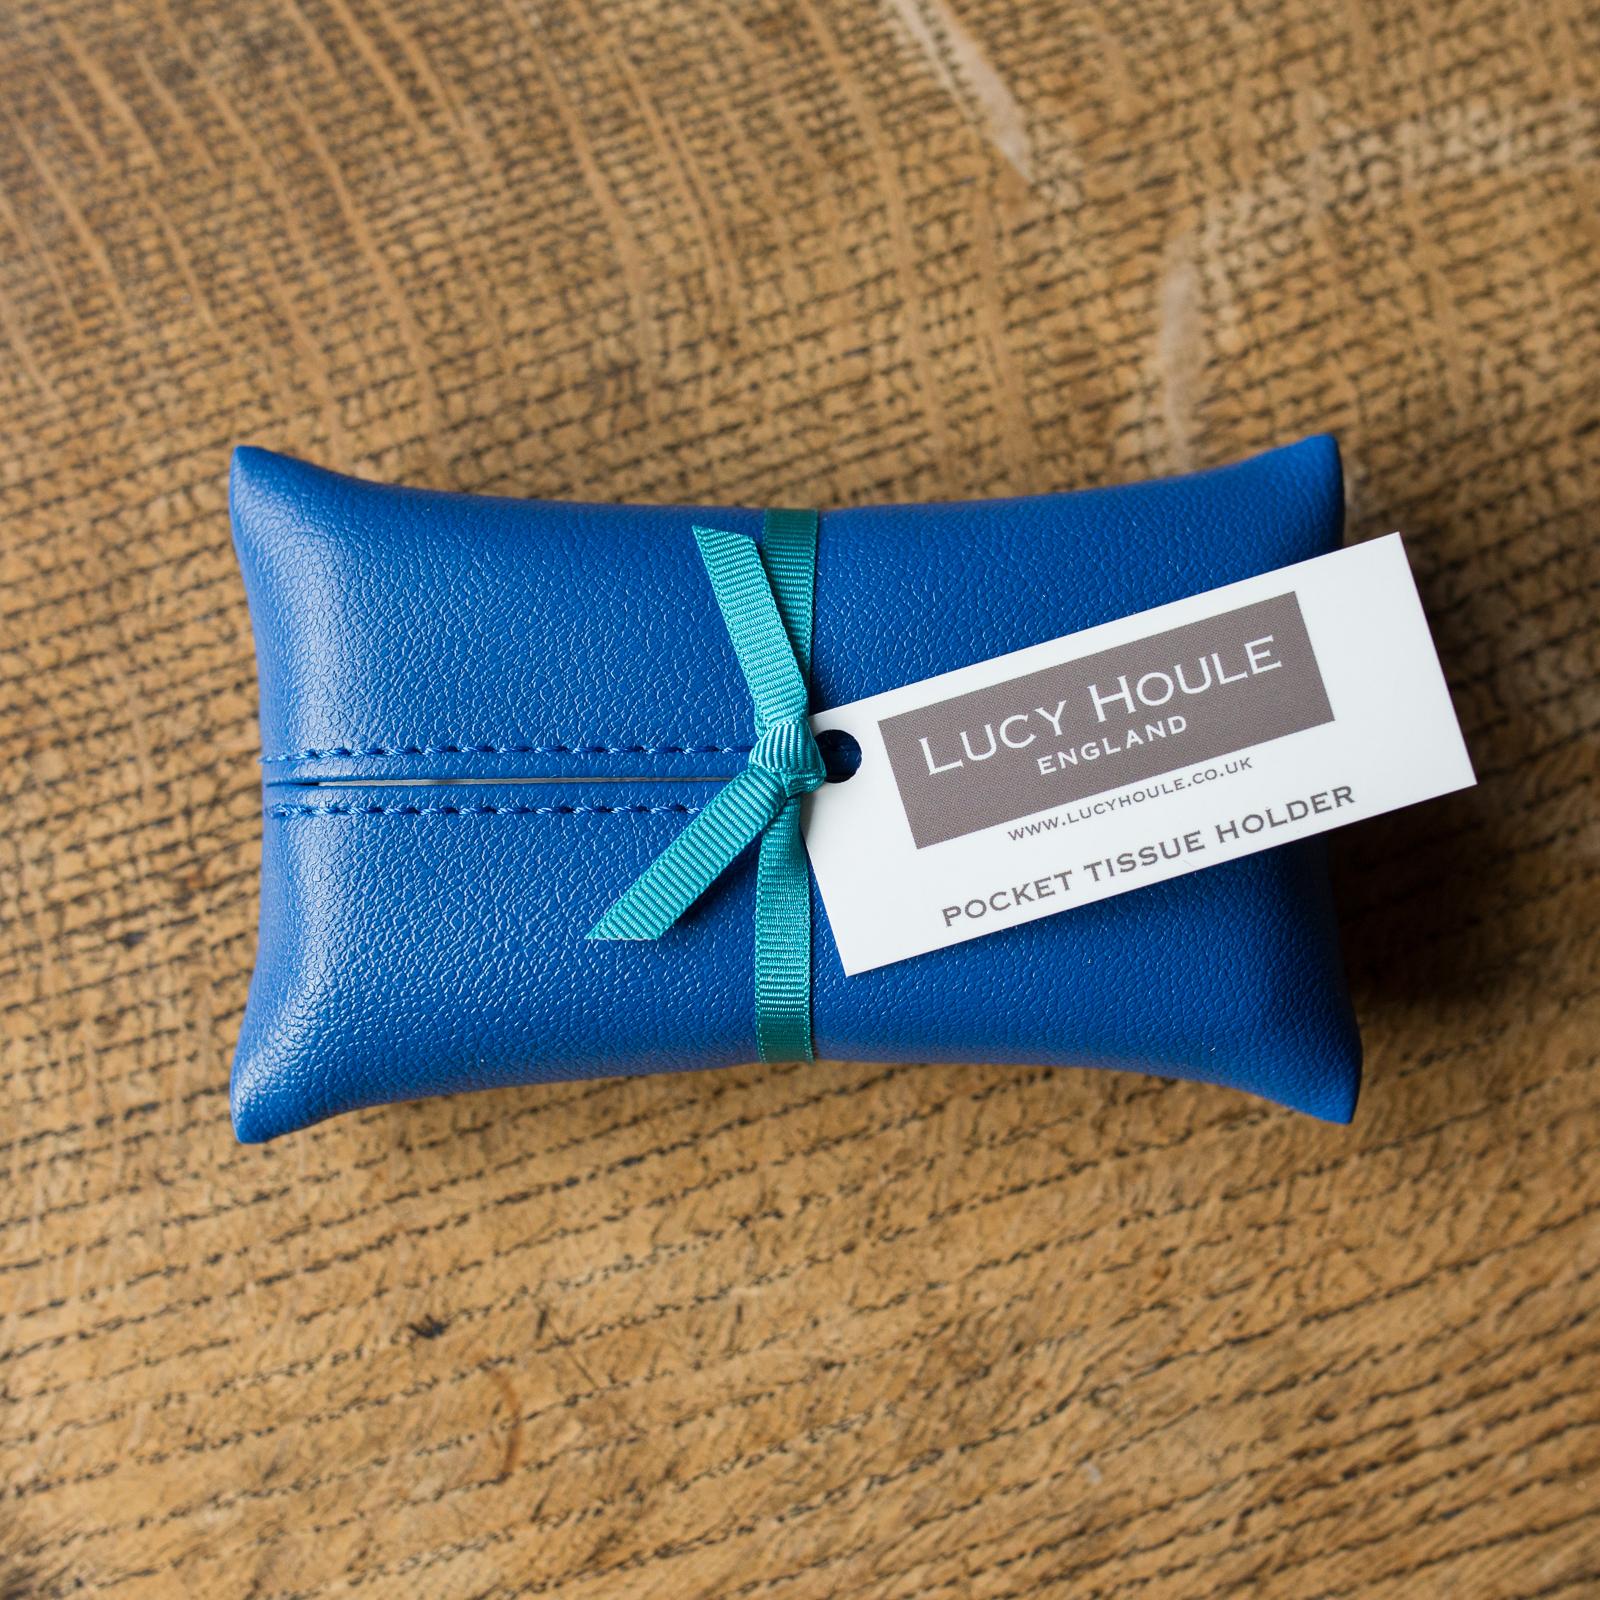 Faux Leather Cobalt Blue Pocket Tissue Holder Turquioise